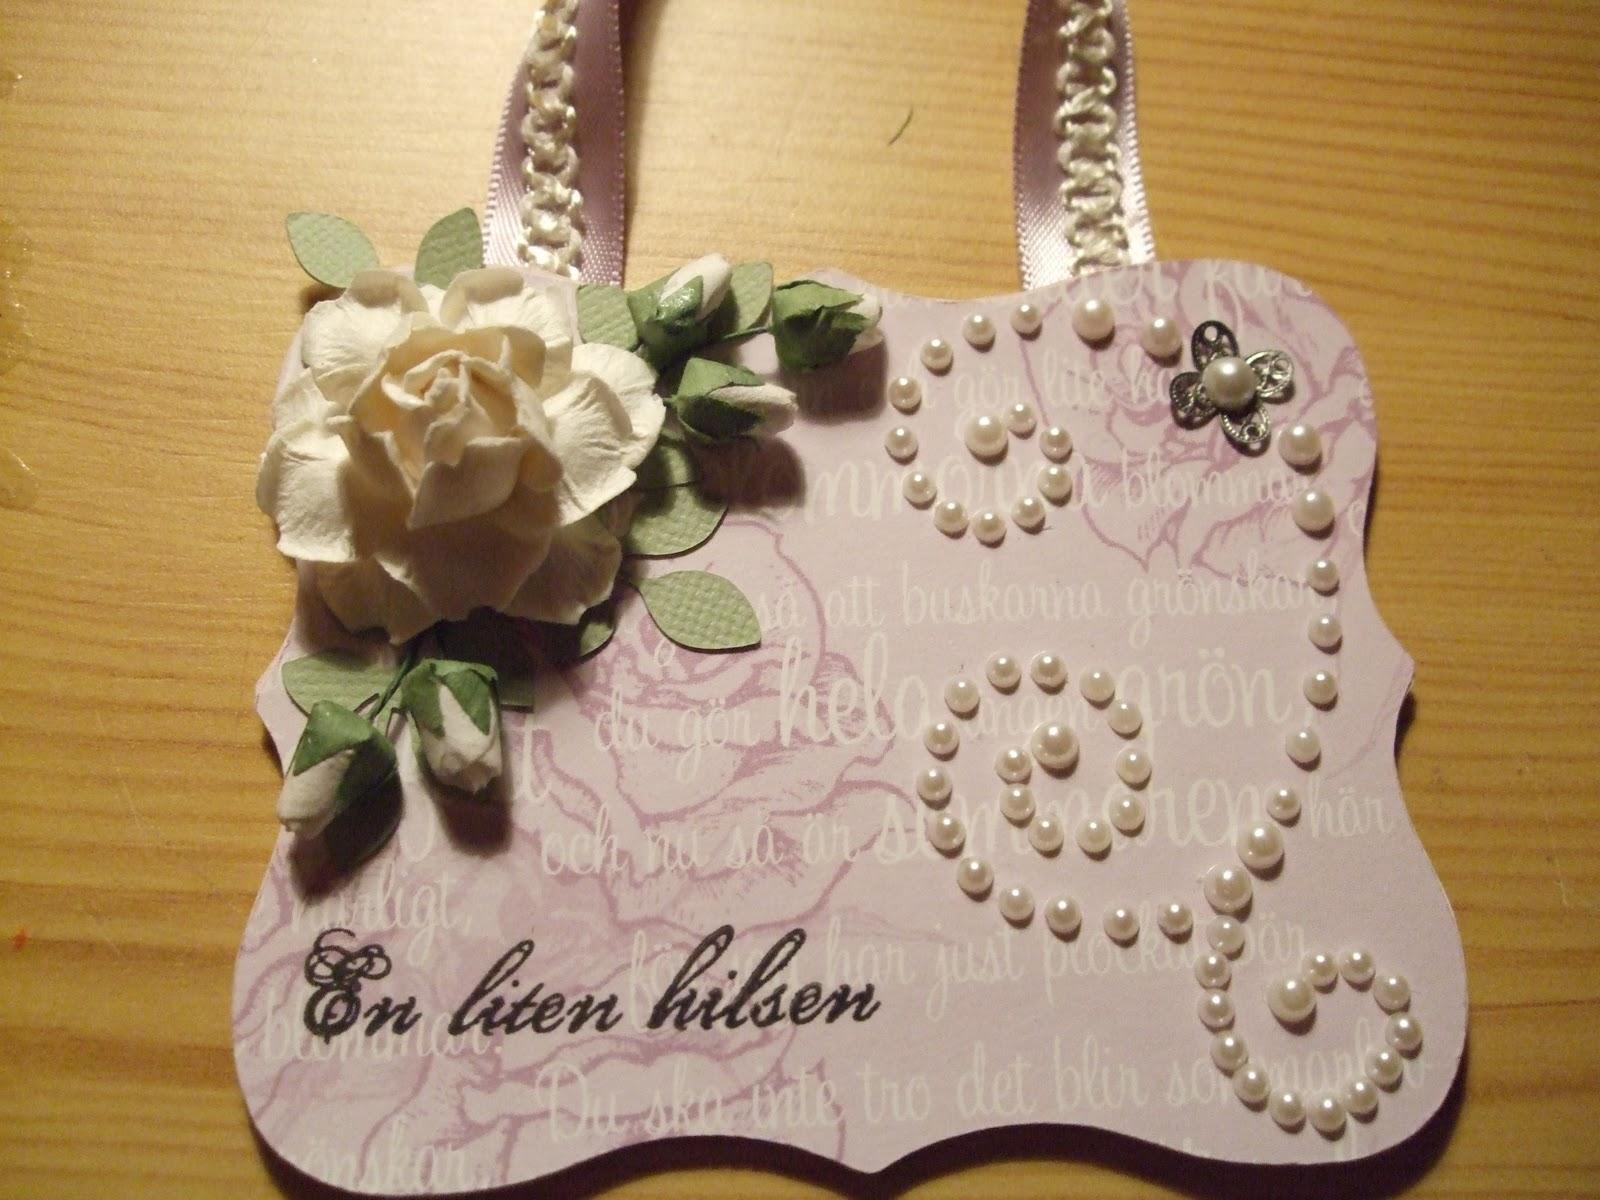 How-to-DIY-Handbag-Style-Paper-Gift-Basket-7.jpg